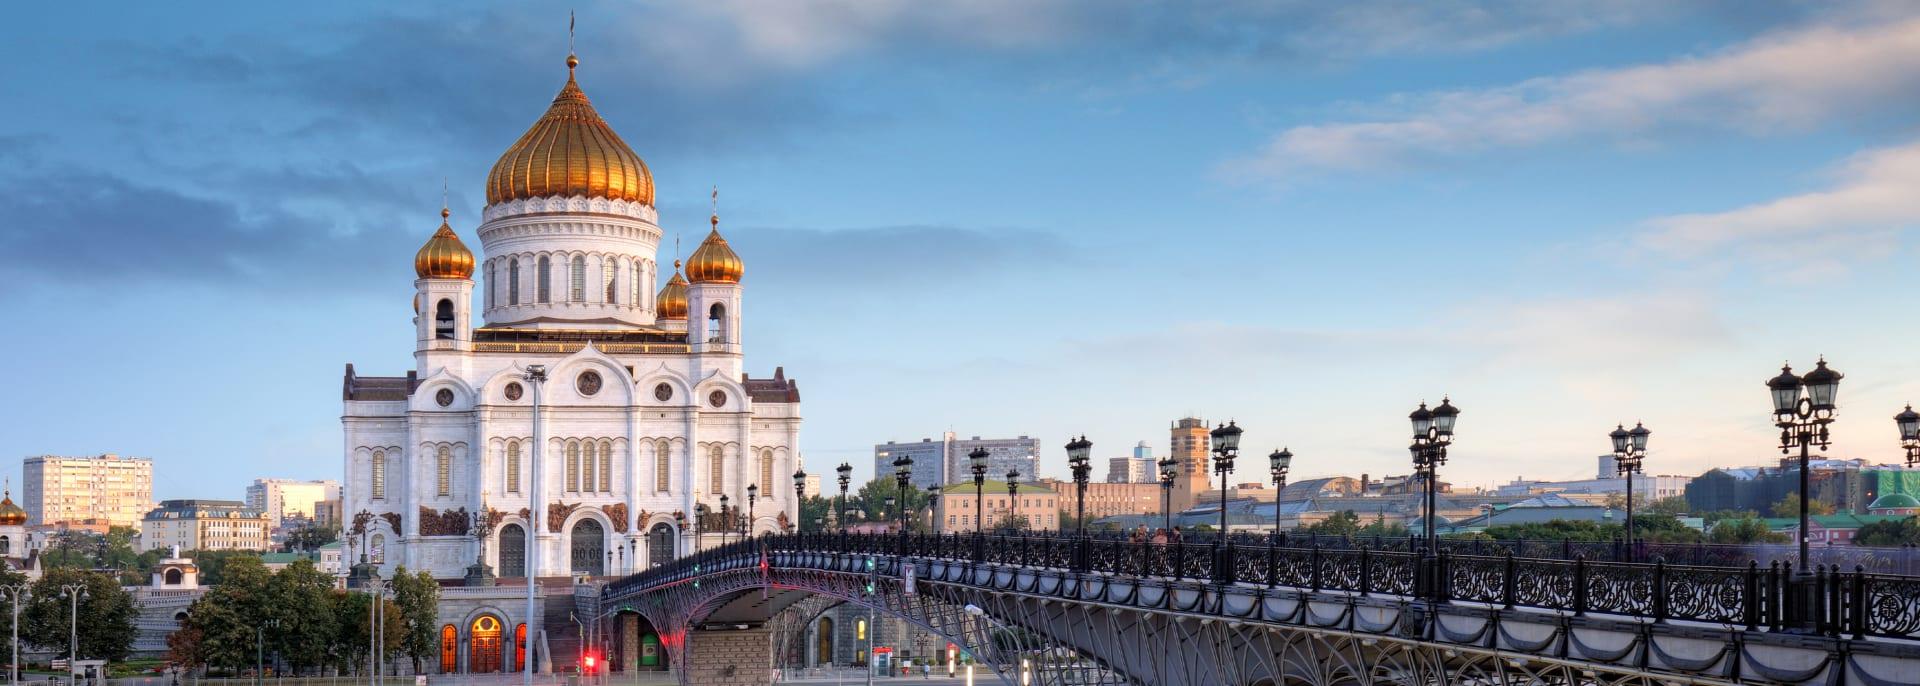 Kathedrale Christi der Erlöser, Moskau, Russland